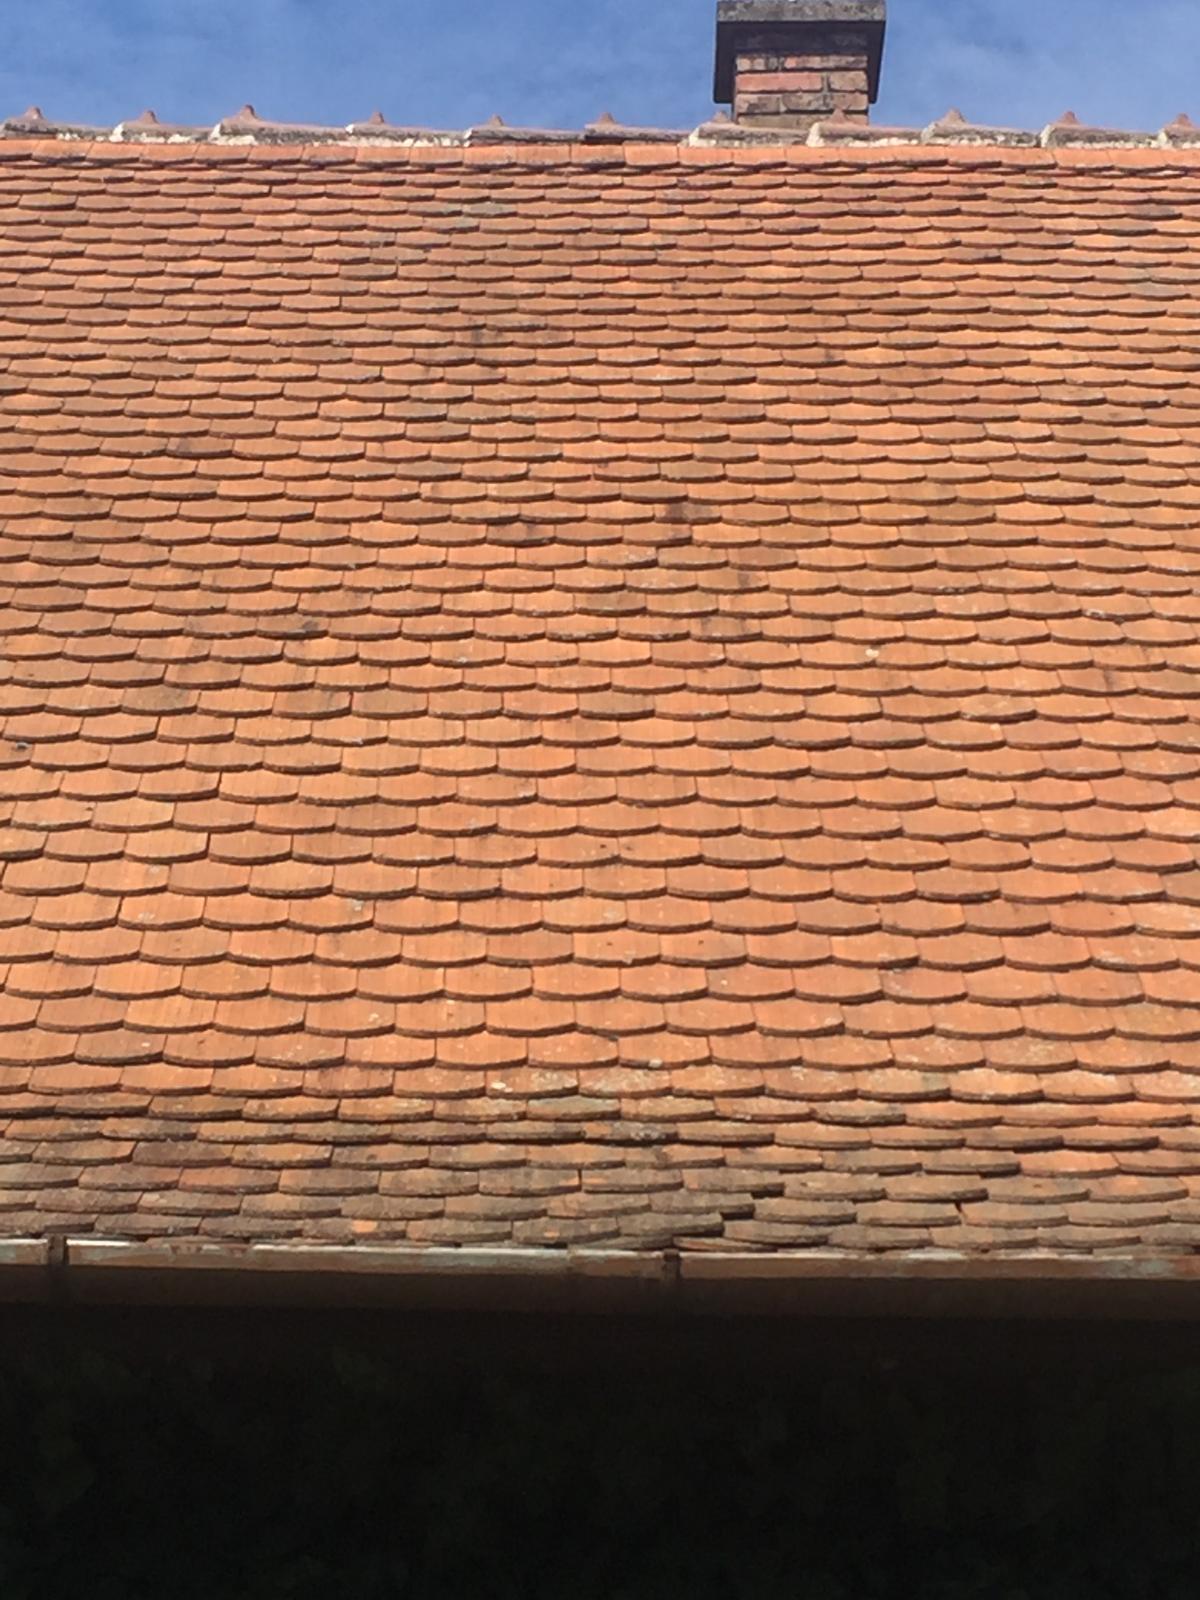 Dom - takúto strechu chcem